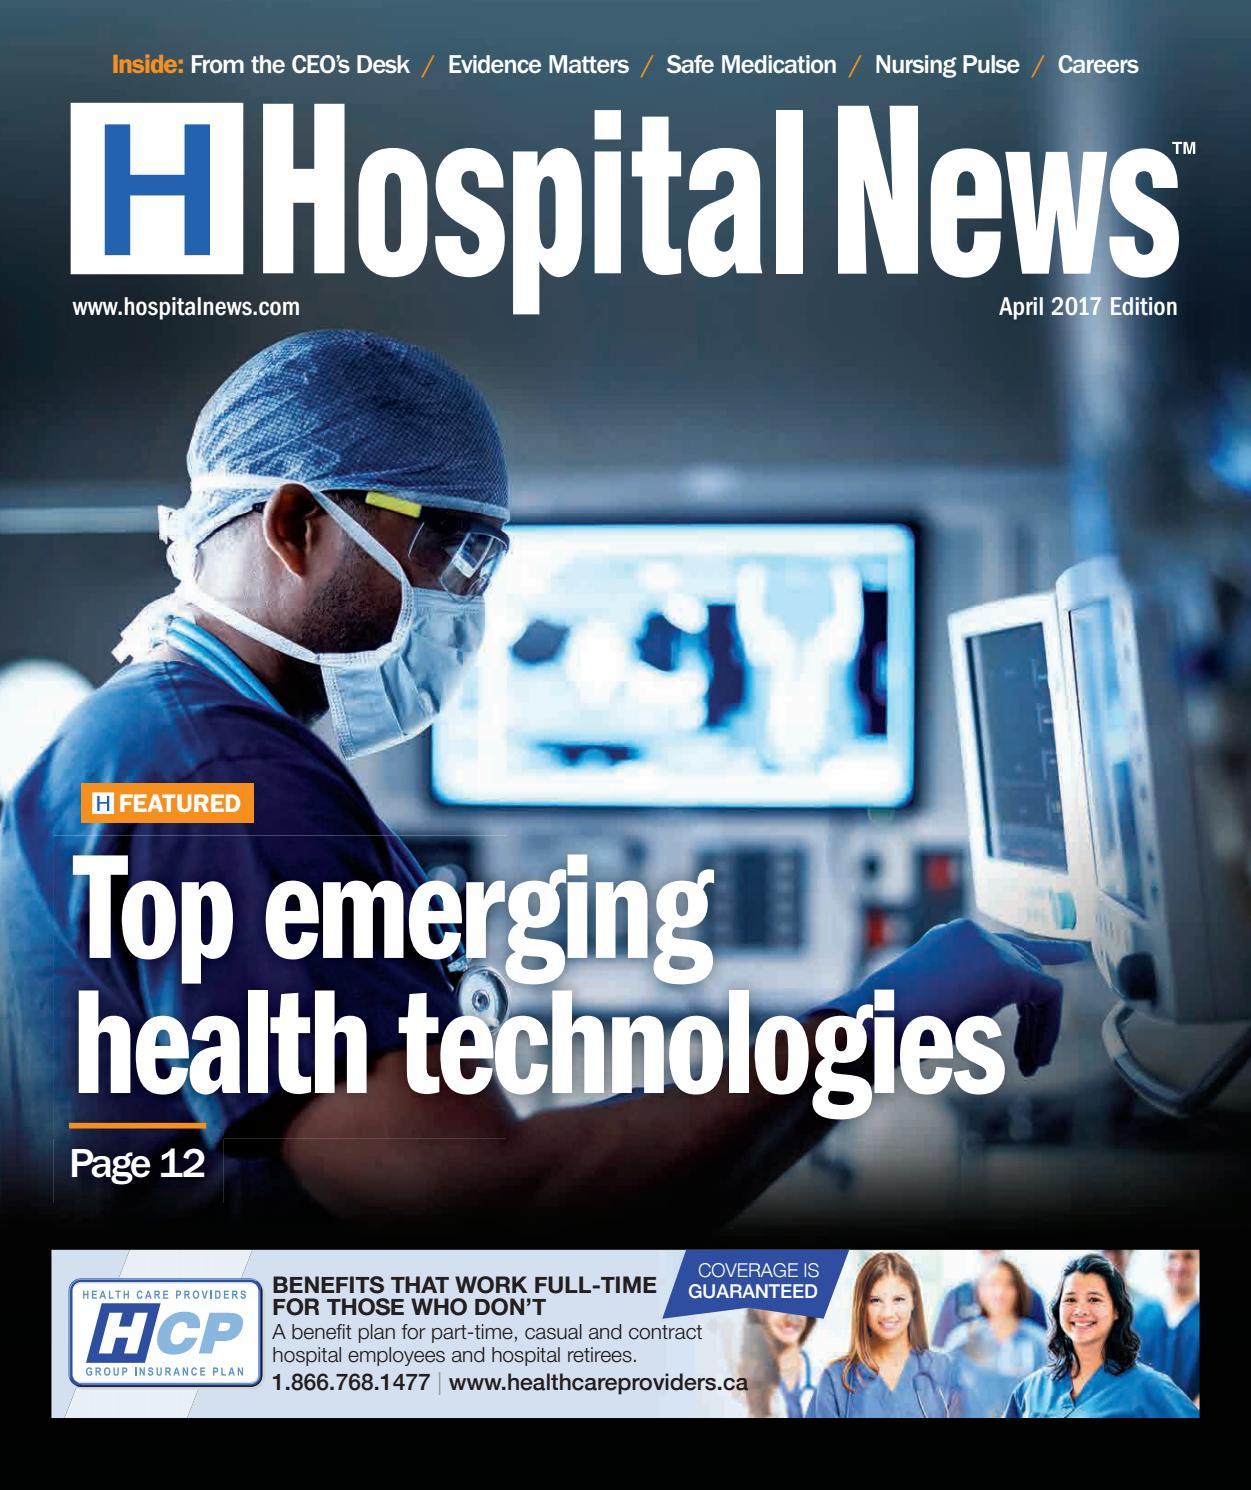 4bb968dbcd Hospital News 2017 April Edition by Hospital News - issuu